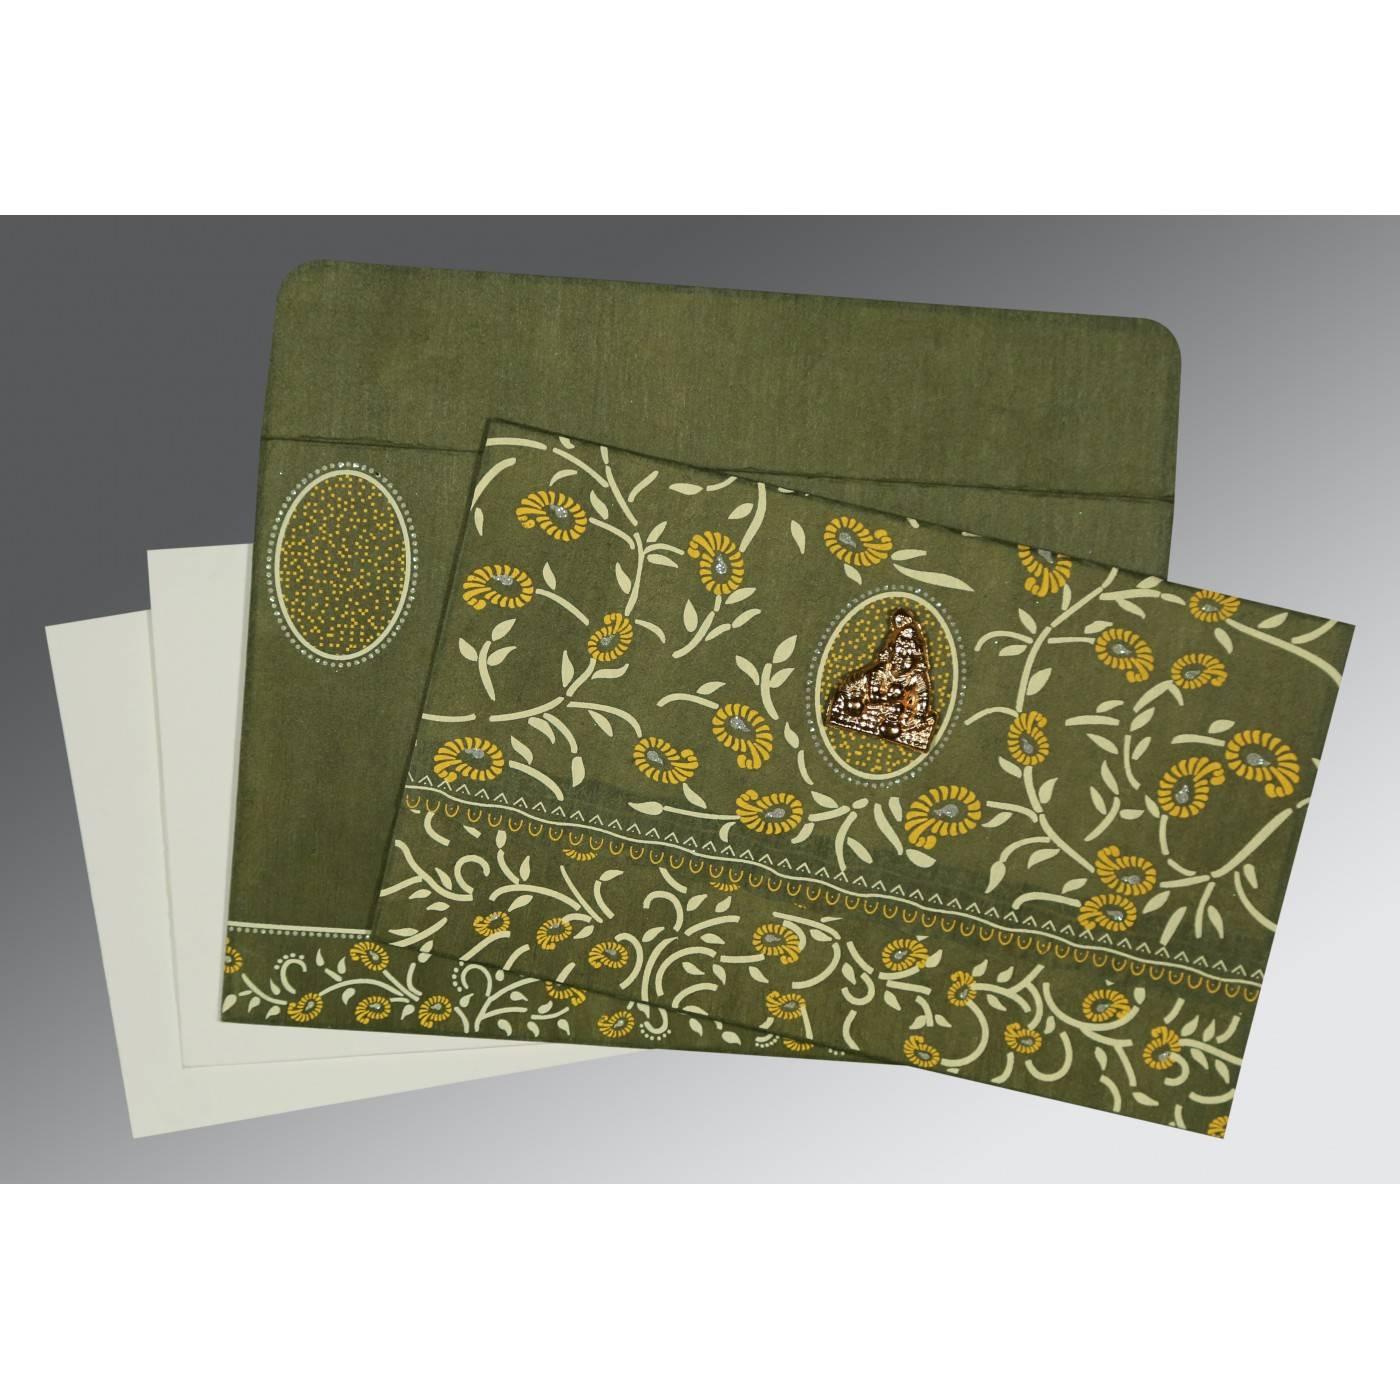 DEEP SAGE WOOLY FLORAL THEMED - GLITTER WEDDING CARD : CG-8206D - IndianWeddingCards